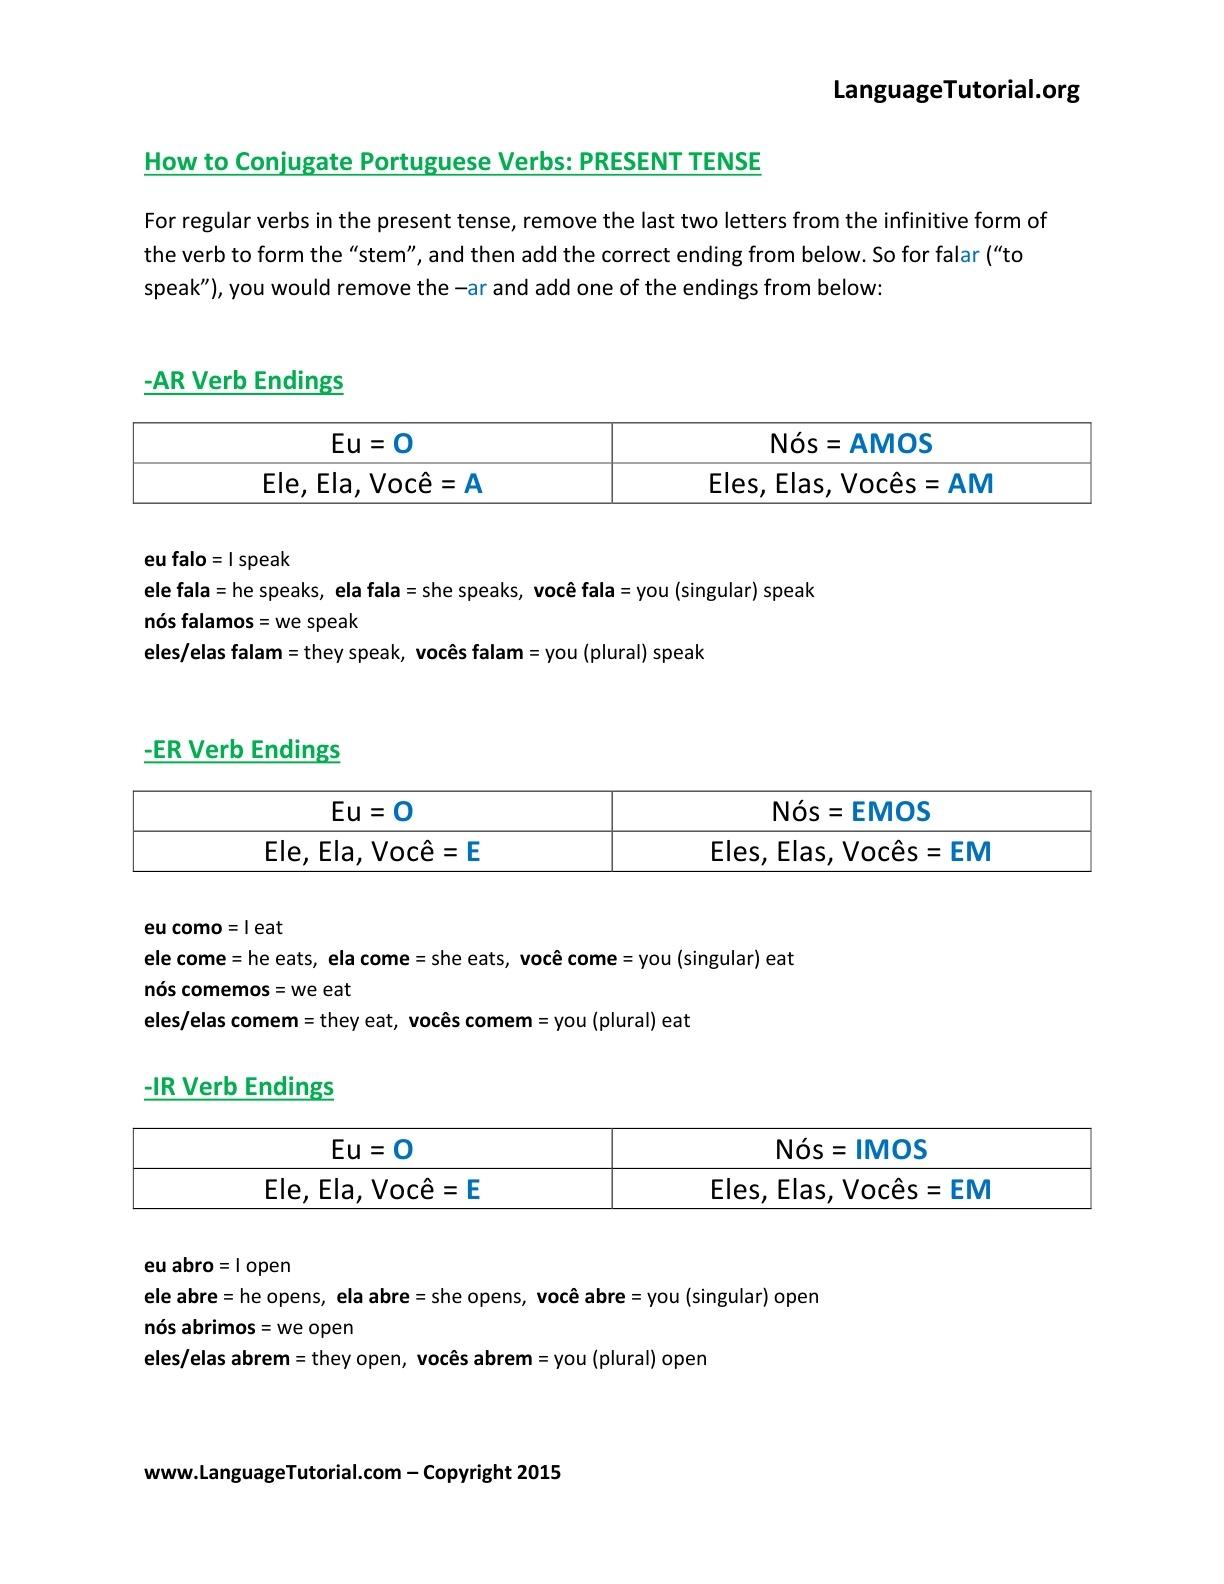 Free Portuguese Worksheets - Online & Printable - Free Printable Portuguese Worksheets